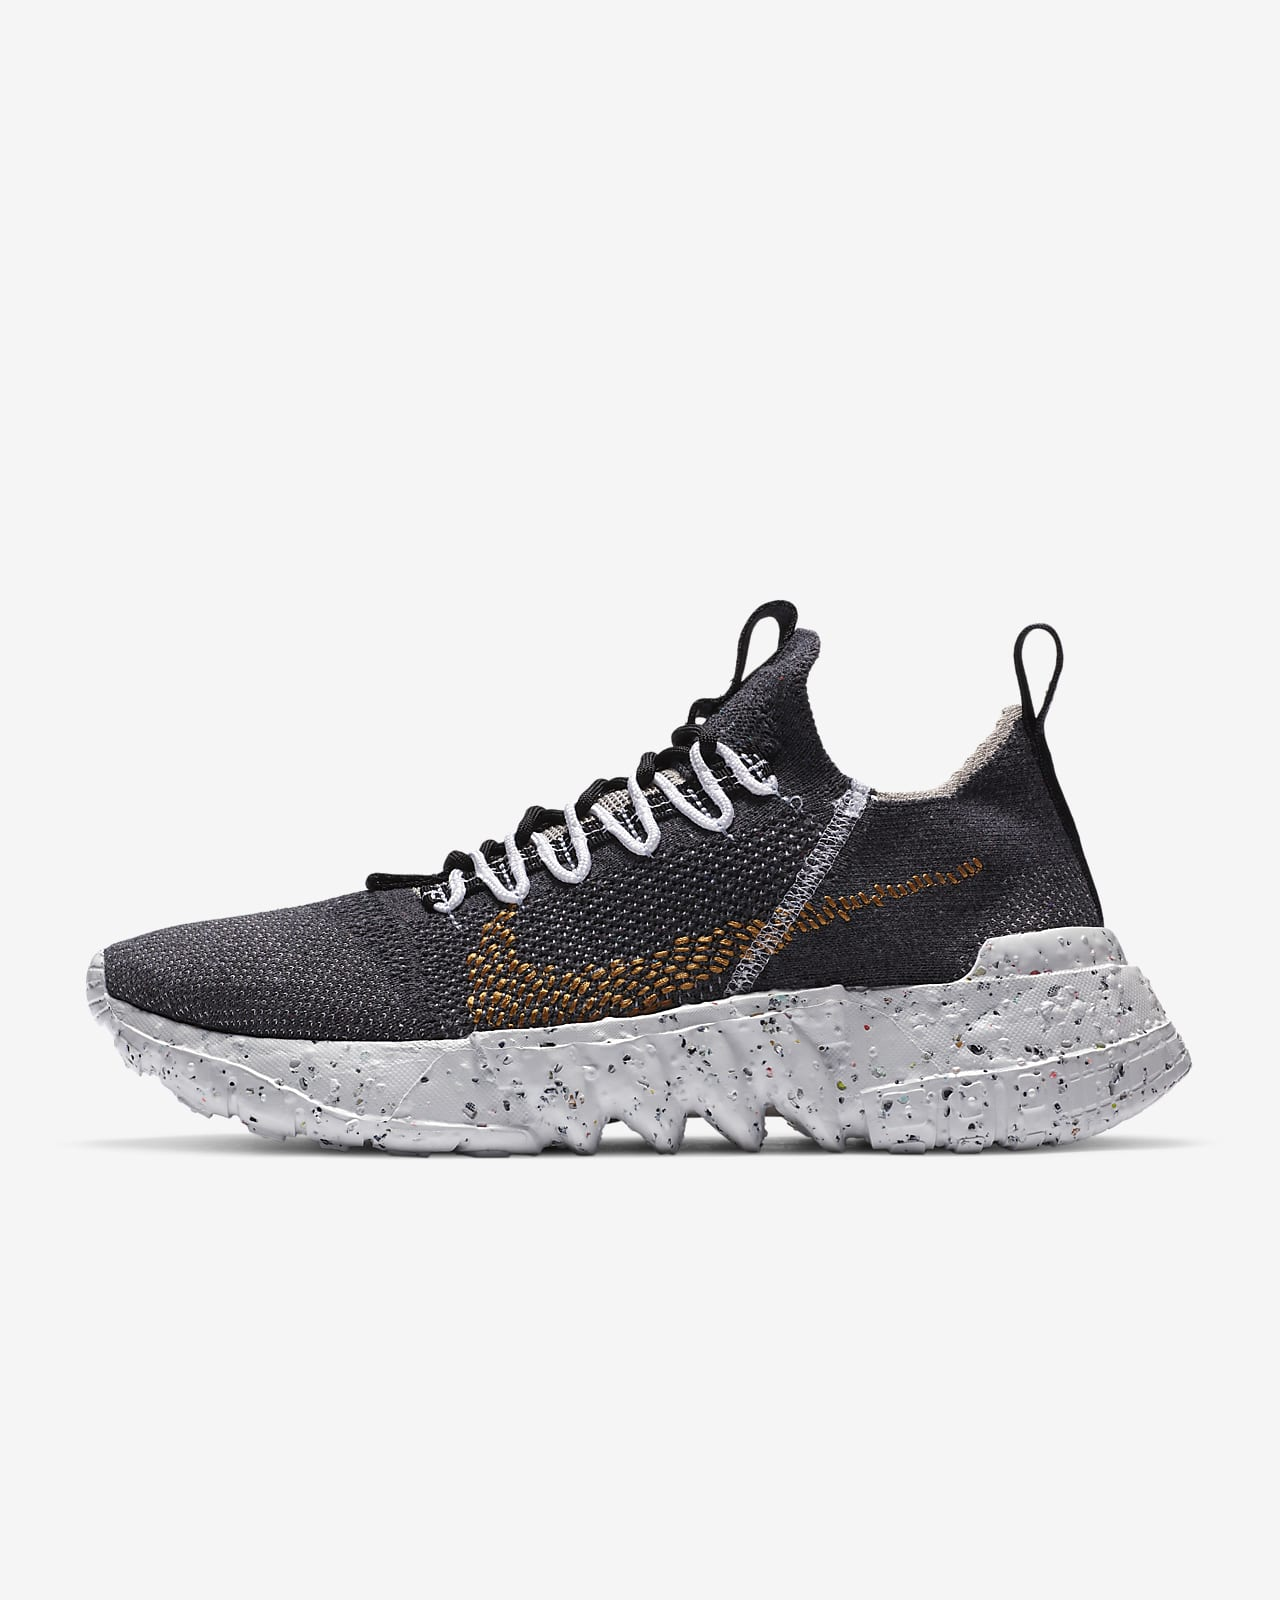 Chaussure Nike Space Hippie 01